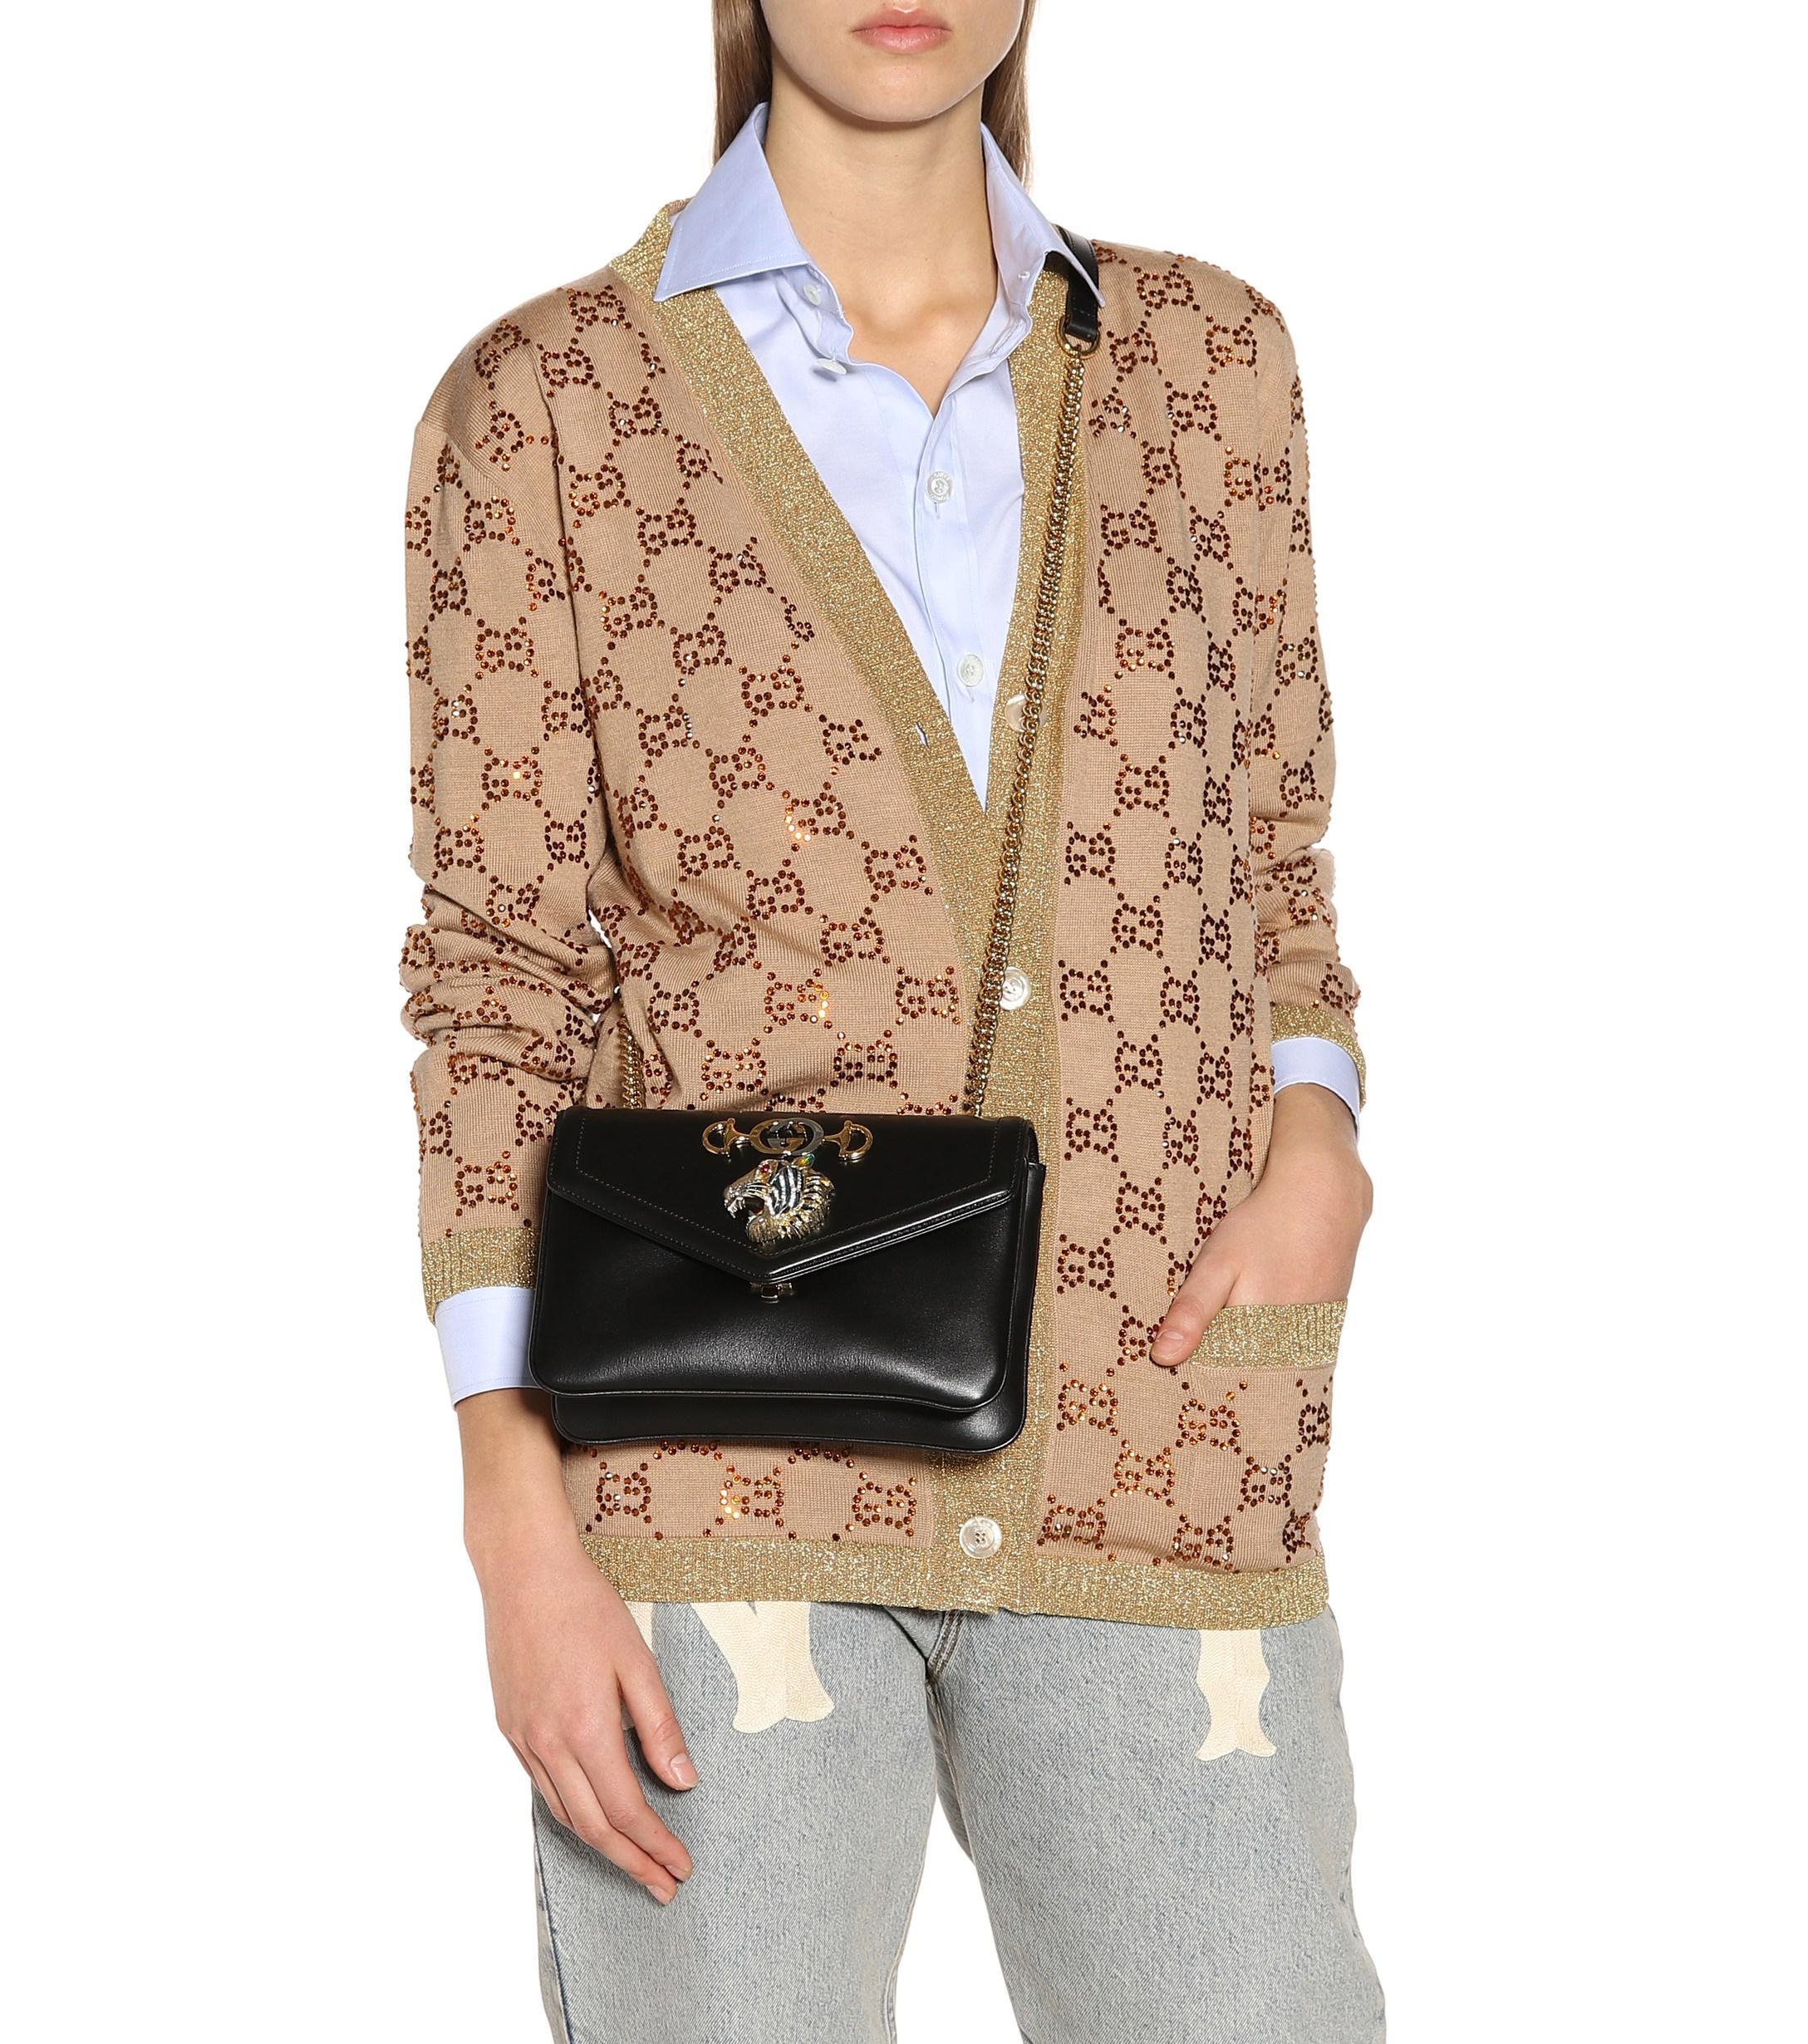 b2f2d7832 Gucci Rajah Small Leather Shoulder Bag in Black - Lyst